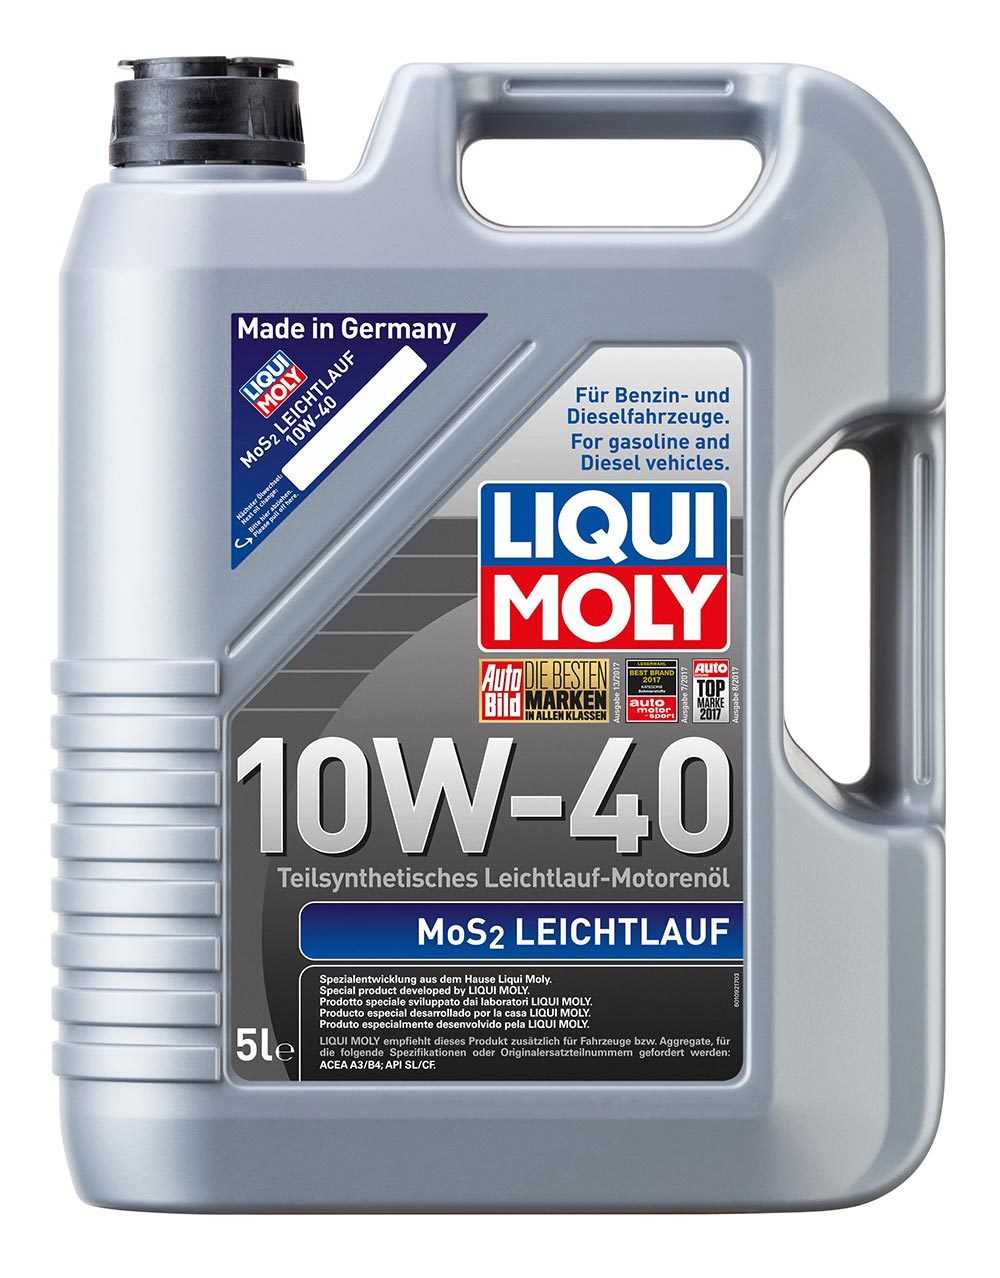 Масло моторное синт.10W-40 MoS2 Leichtlauf 5л ACEA A3 ACEA B4 API SL